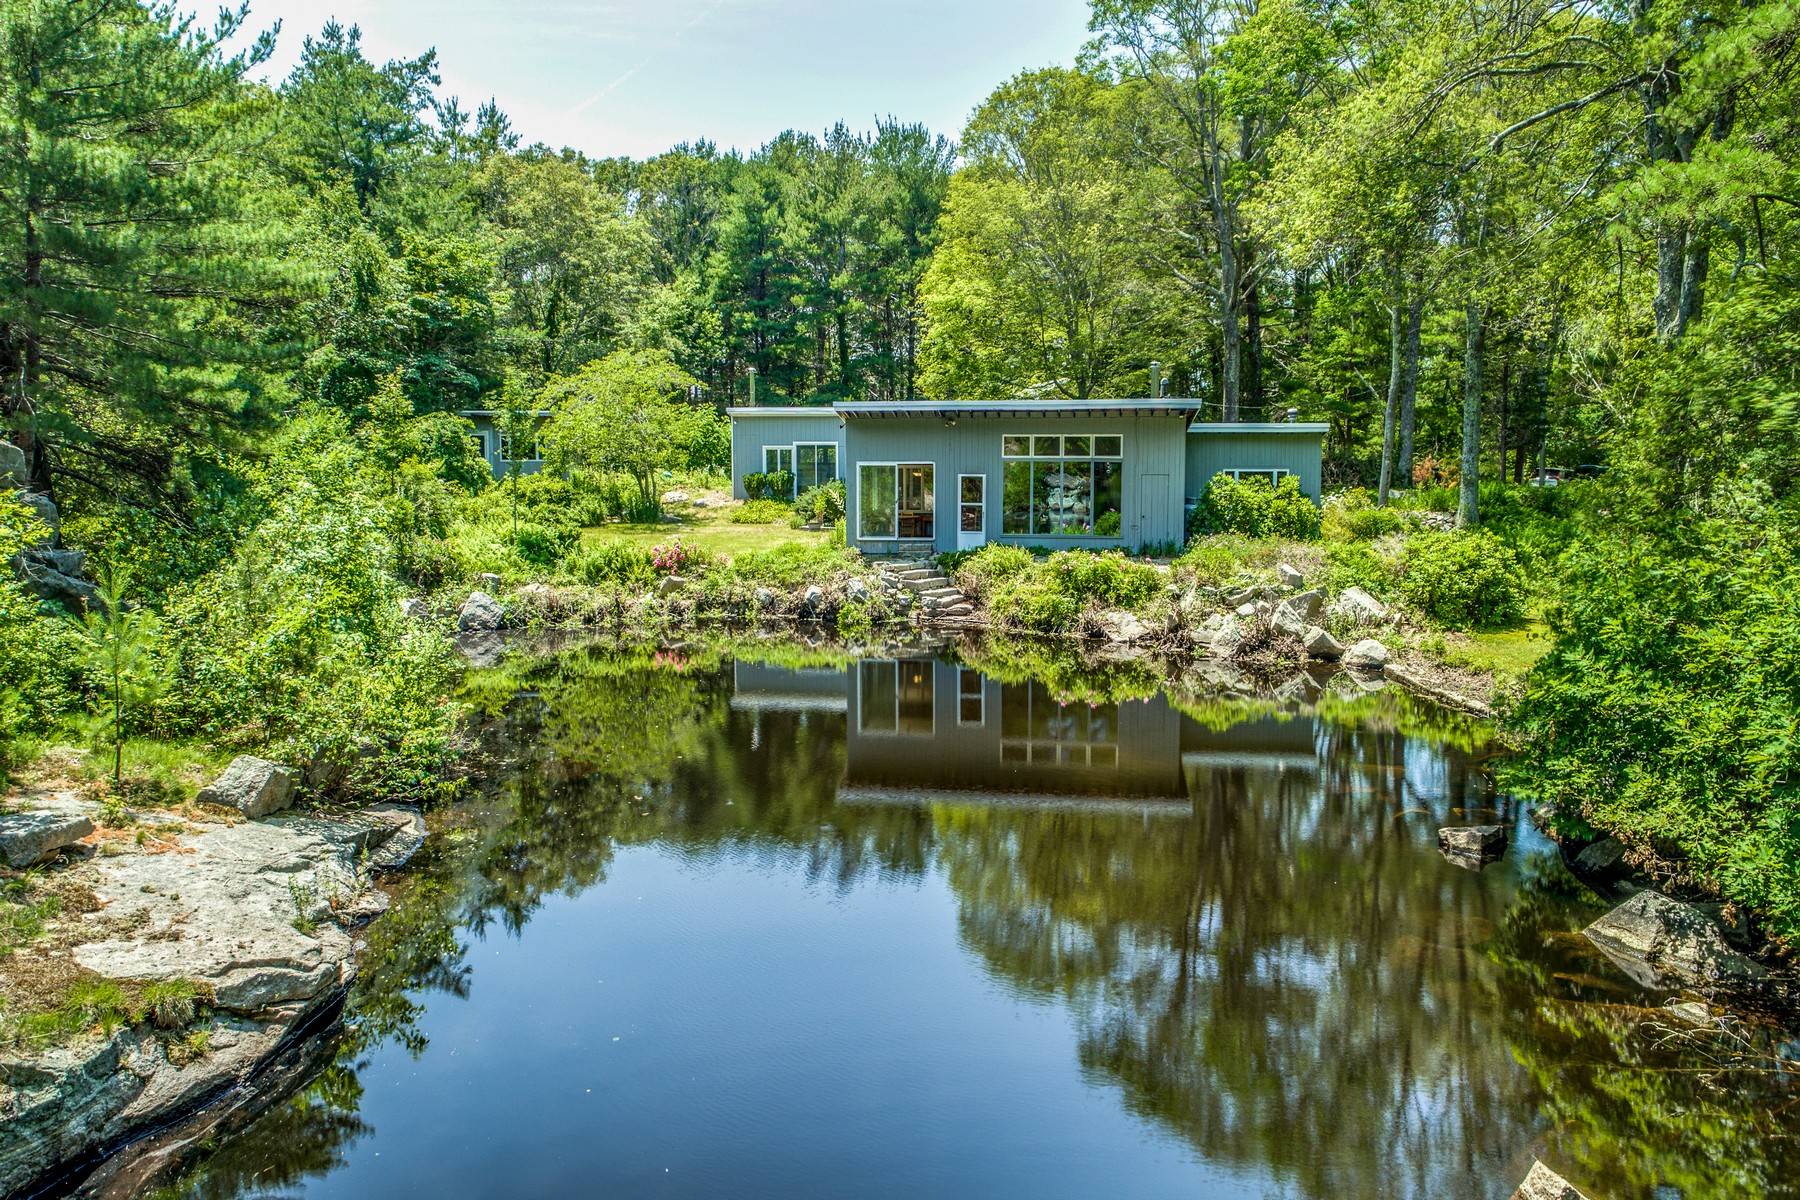 Casa Unifamiliar por un Venta en Mid-Century Modern Private Sanctuary 9 Barberry Heights Road Gloucester, Massachusetts, 01930 Estados Unidos